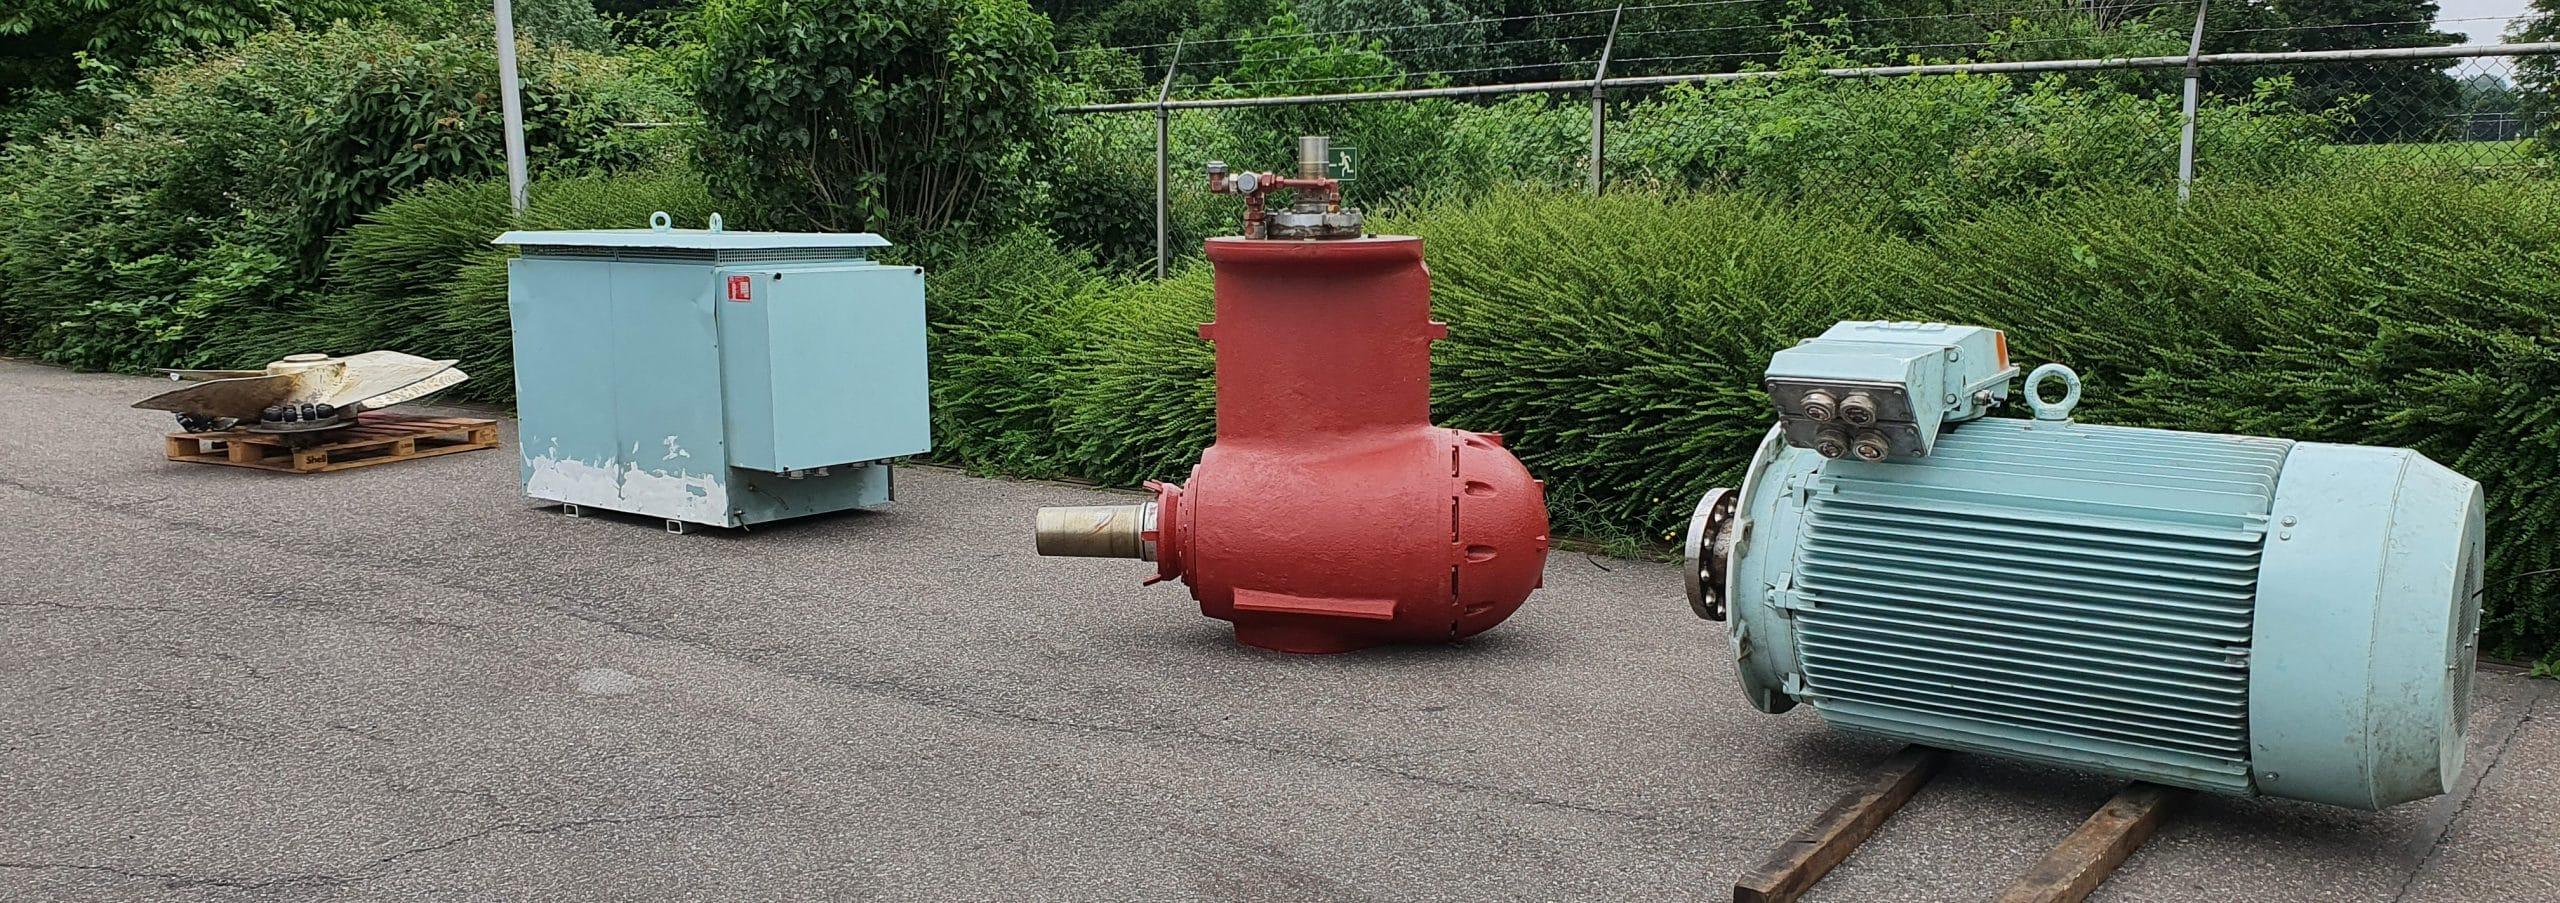 Parts & used equipment